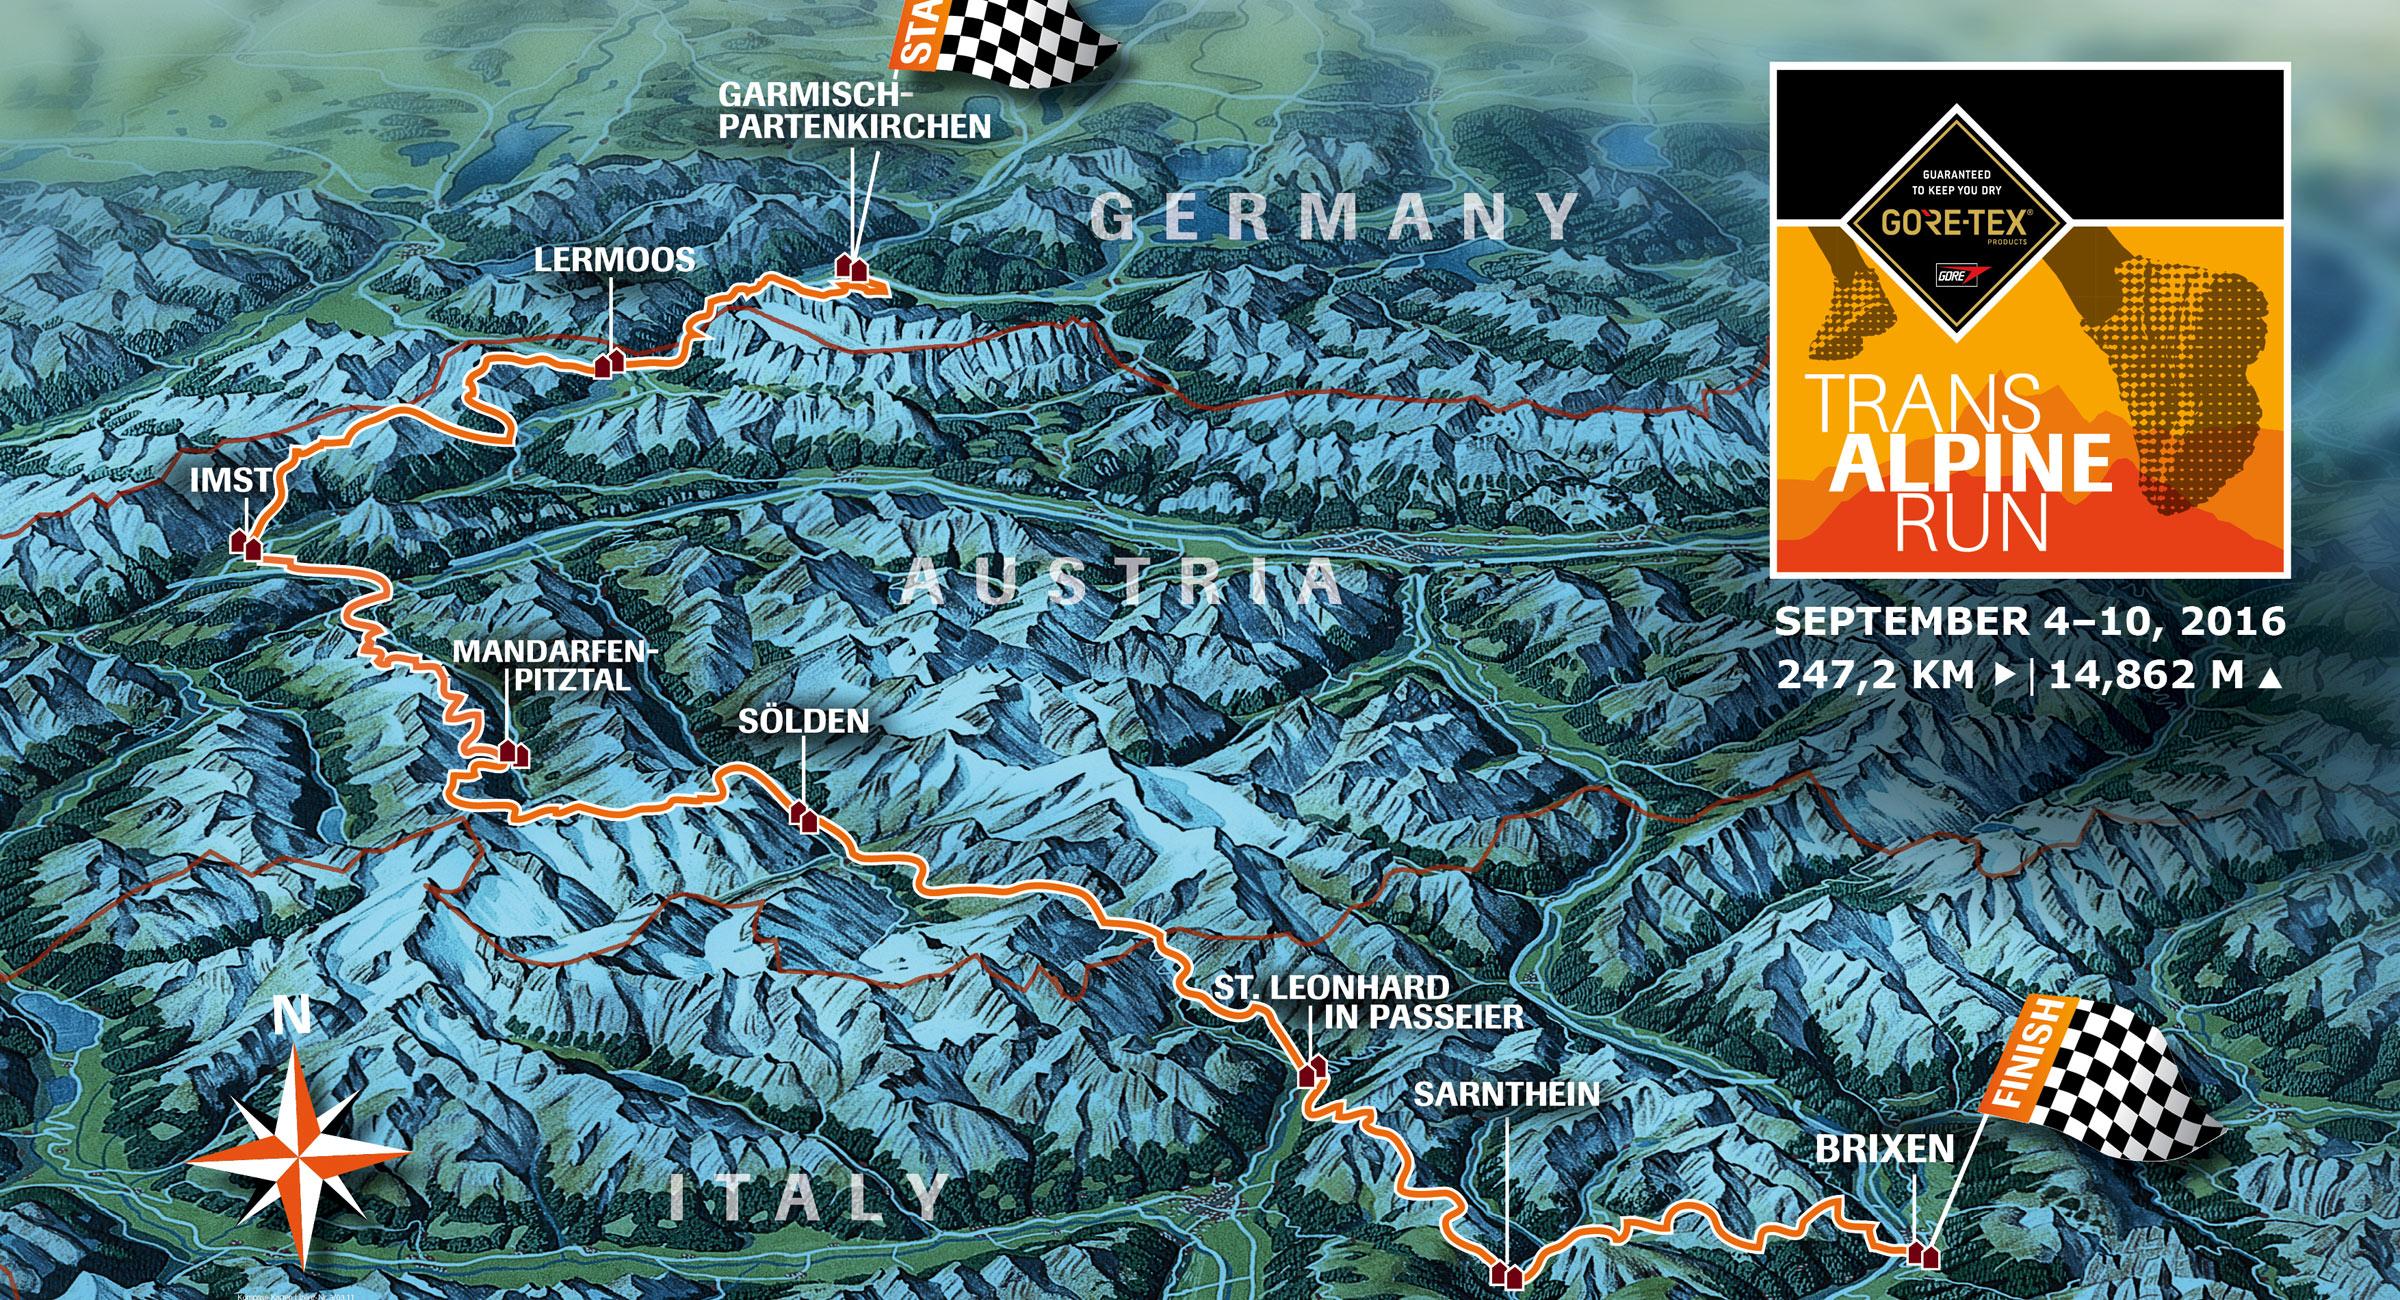 Gore-Tex Transalpine-Run 2016 Map